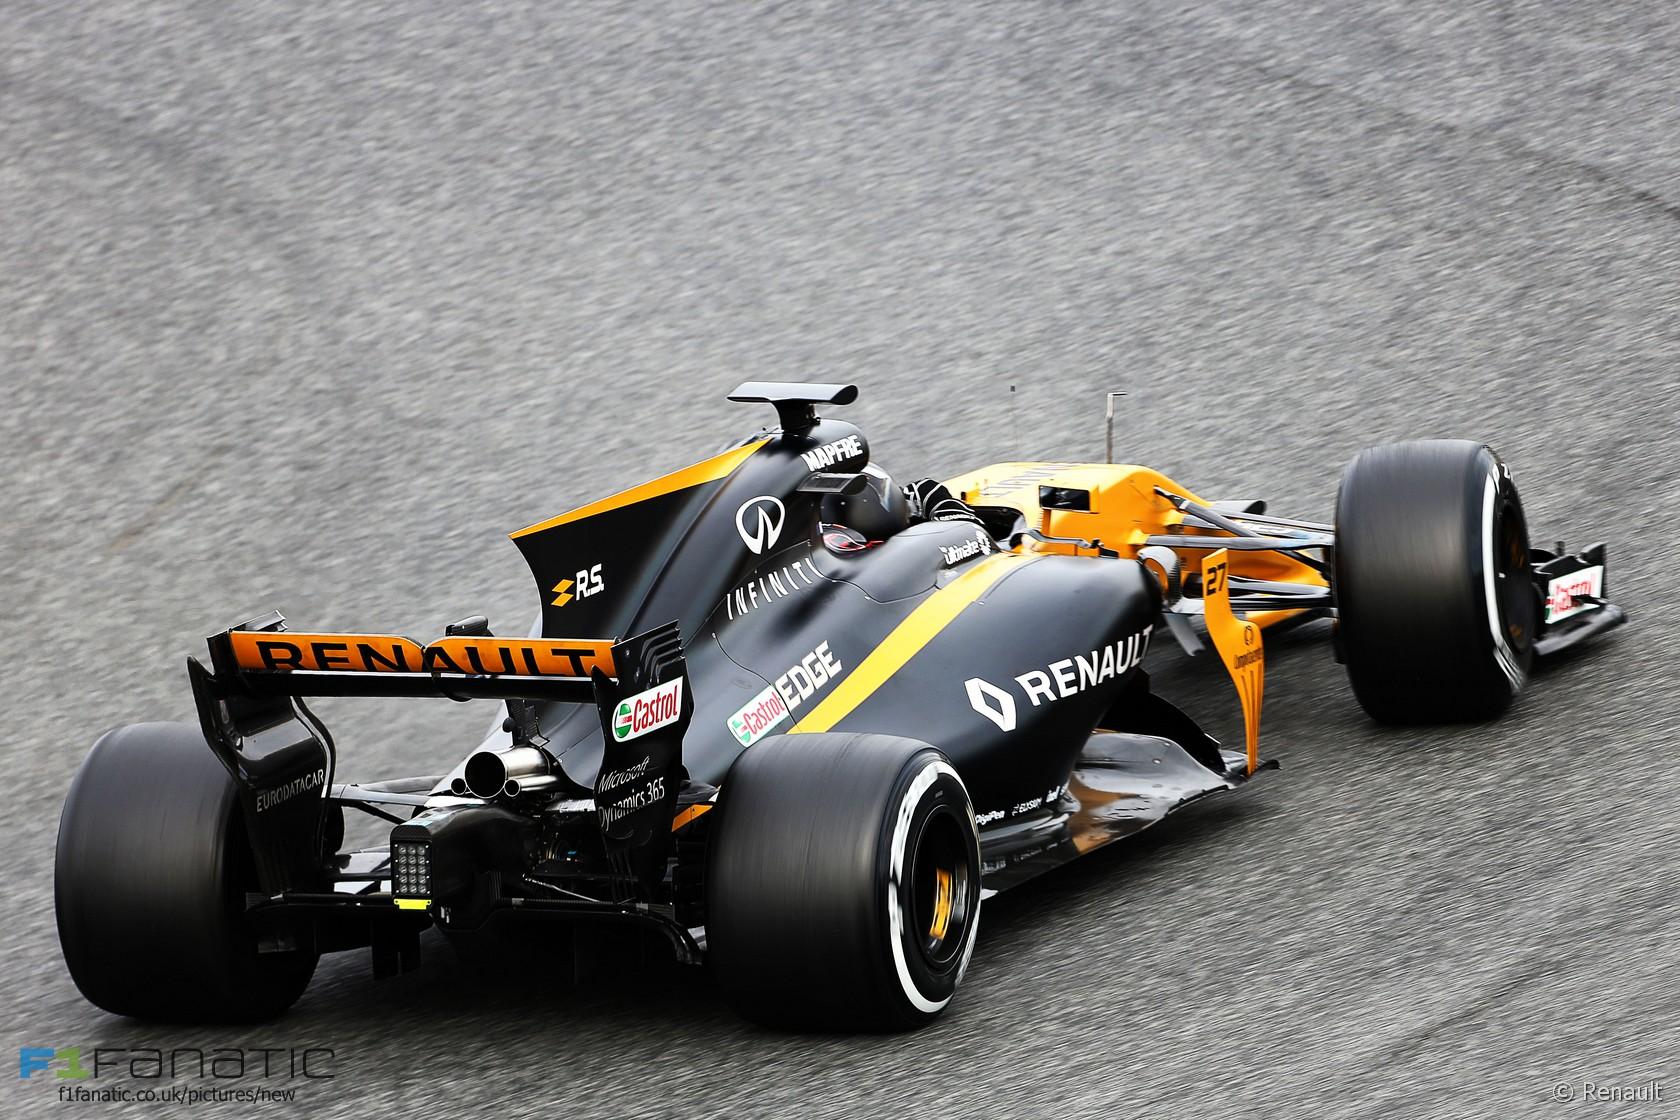 Bonus Racing Formula -653499